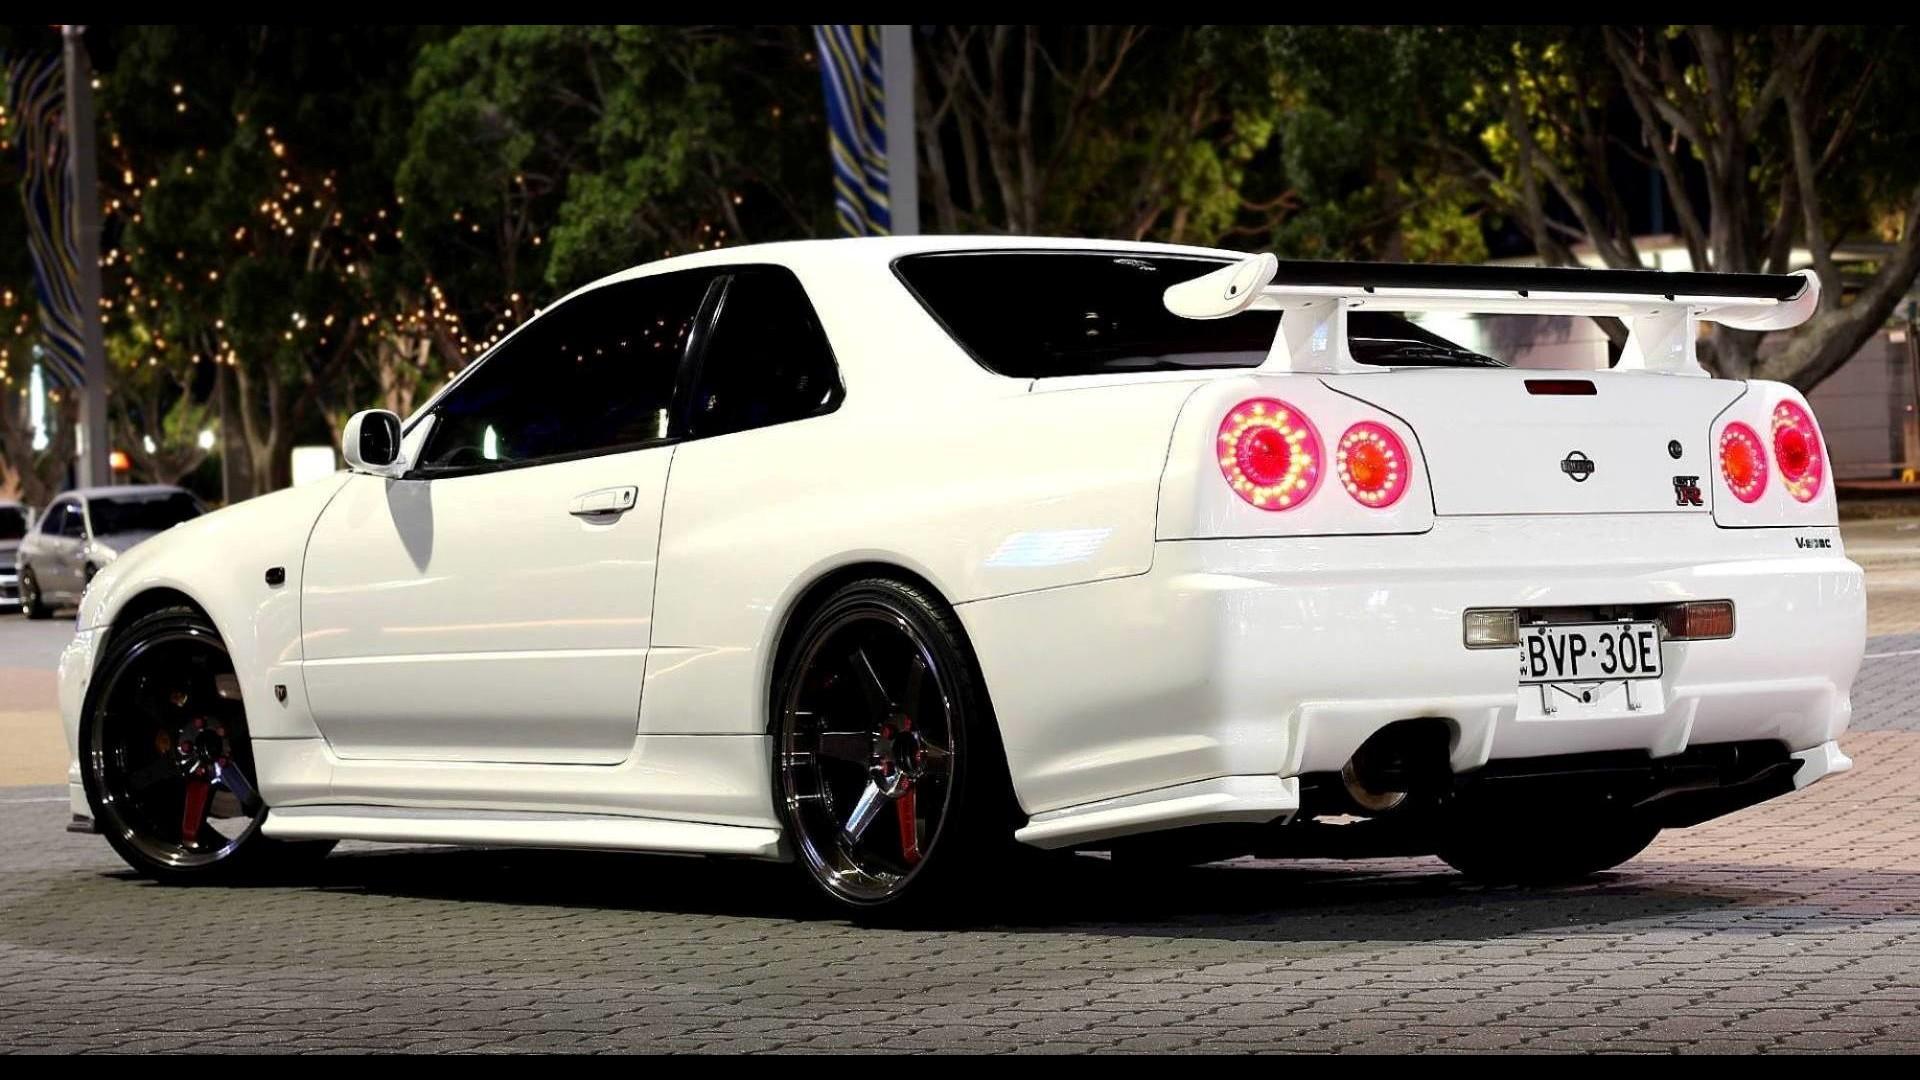 Wallpaper Jdm Sports Car Nissan Skyline Gt R R34 Nissan